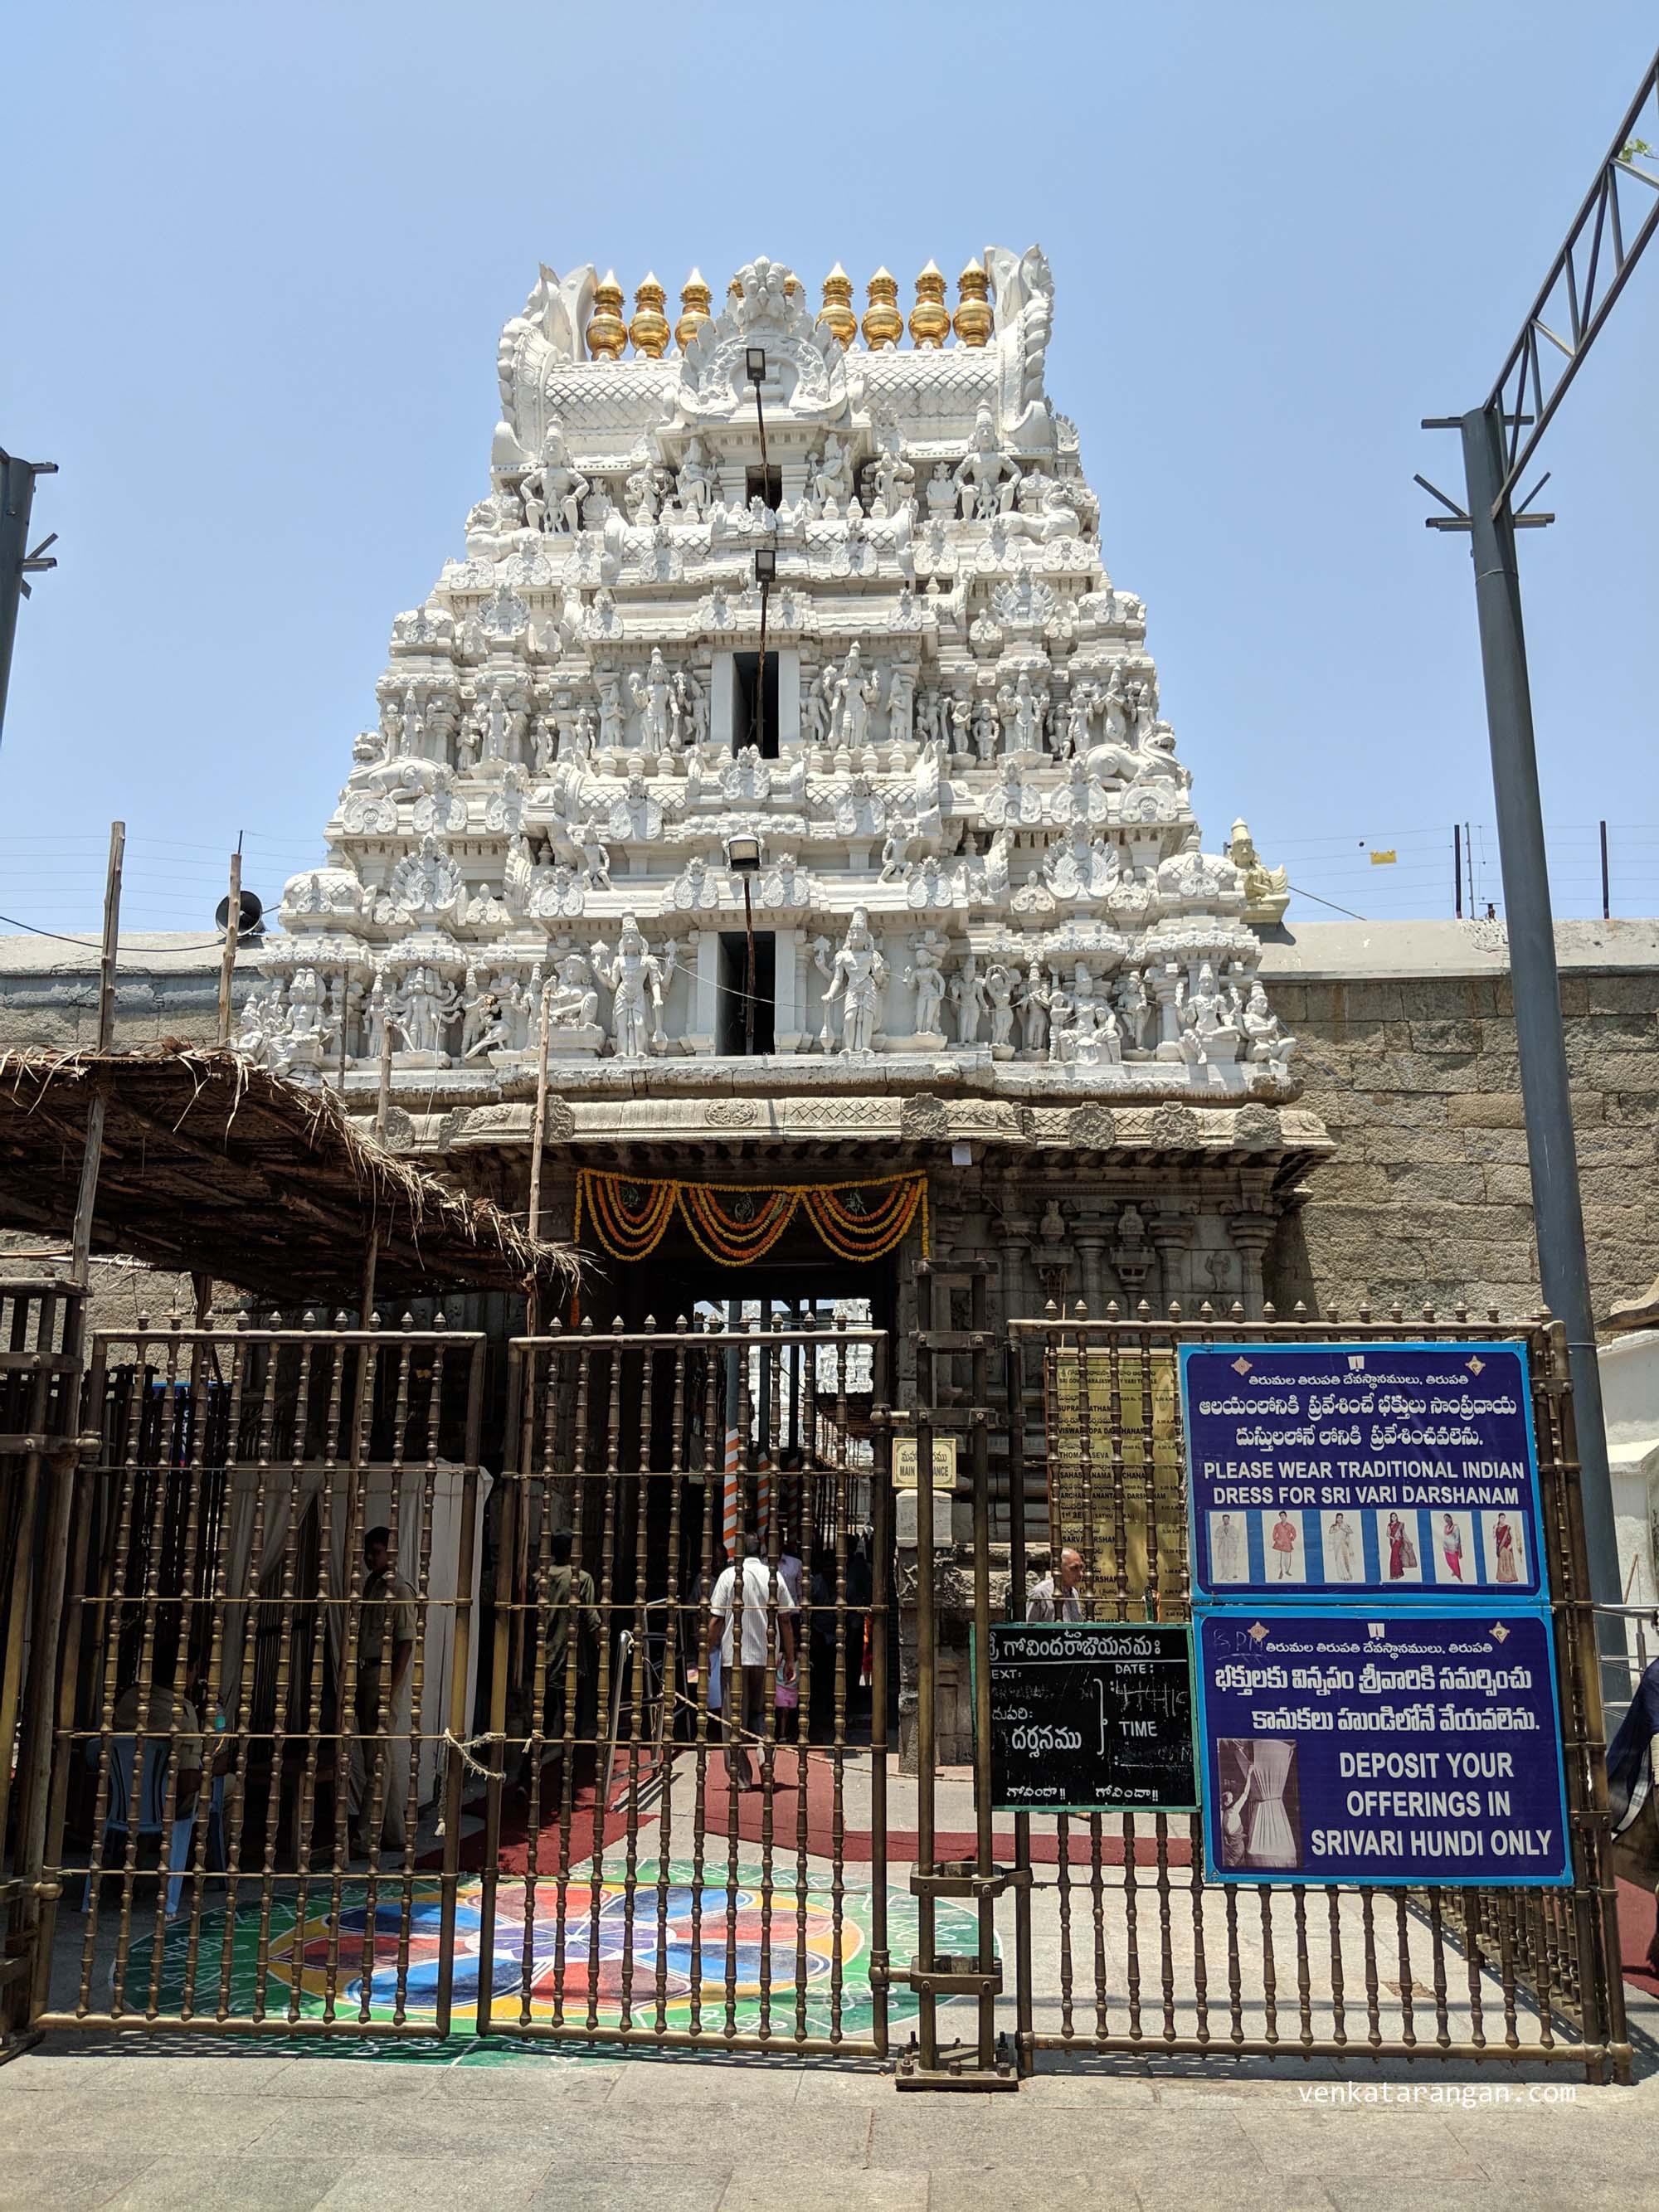 Sri Govindaraja Temple, Tirupati (ஸ்ரீ கோவிந்தராஜ சுவாமி கோயில், திருப்பதி)